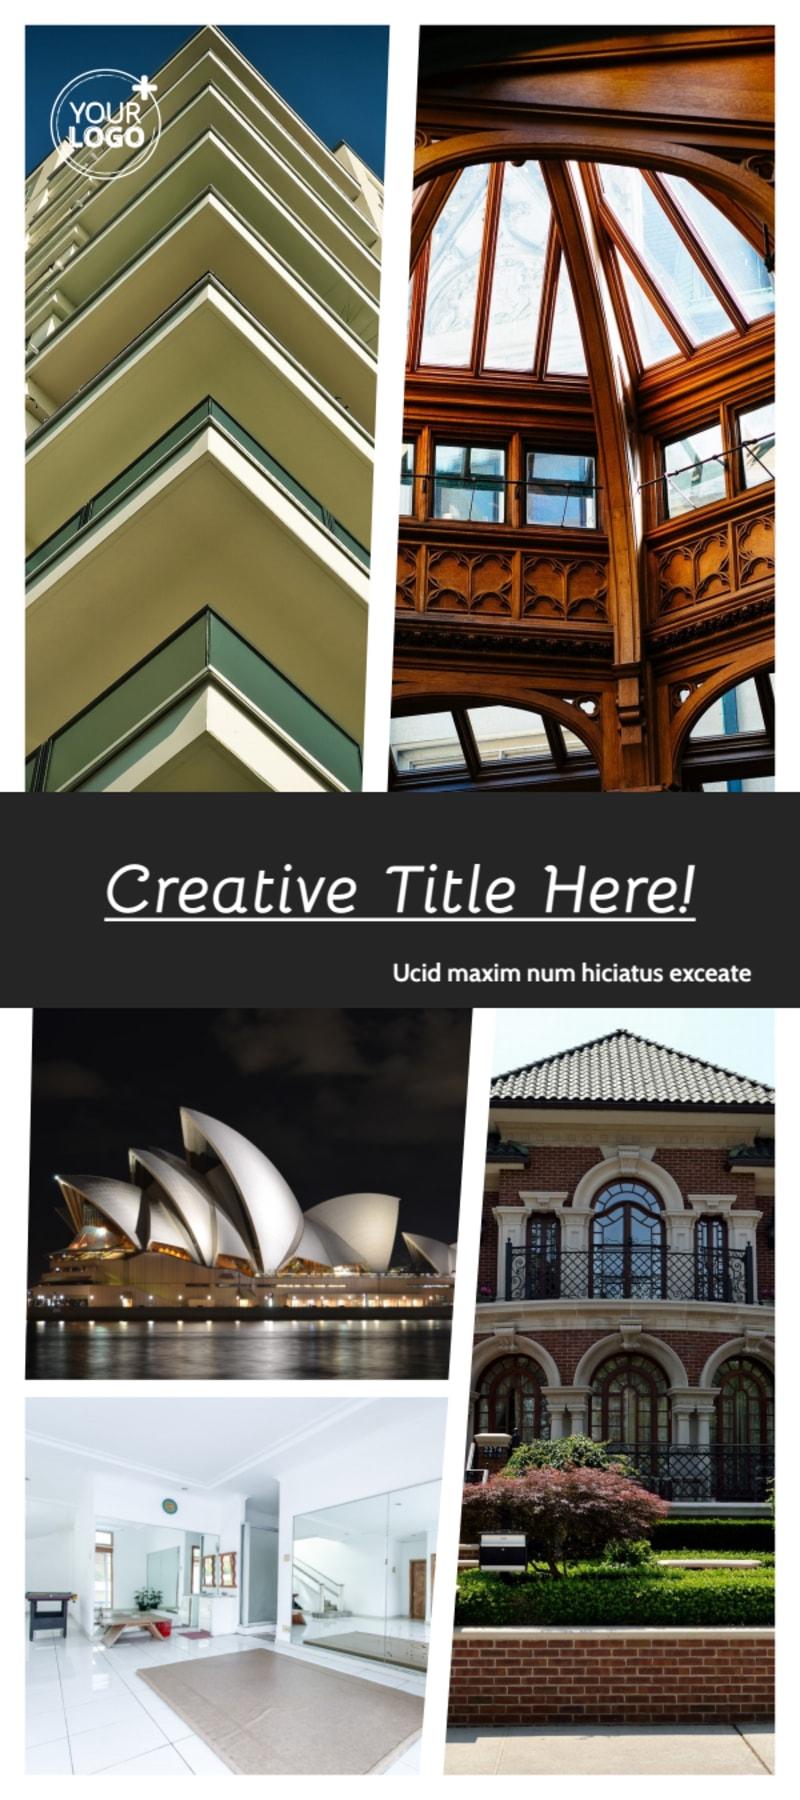 Architecture & Design Service Flyer Template Preview 2